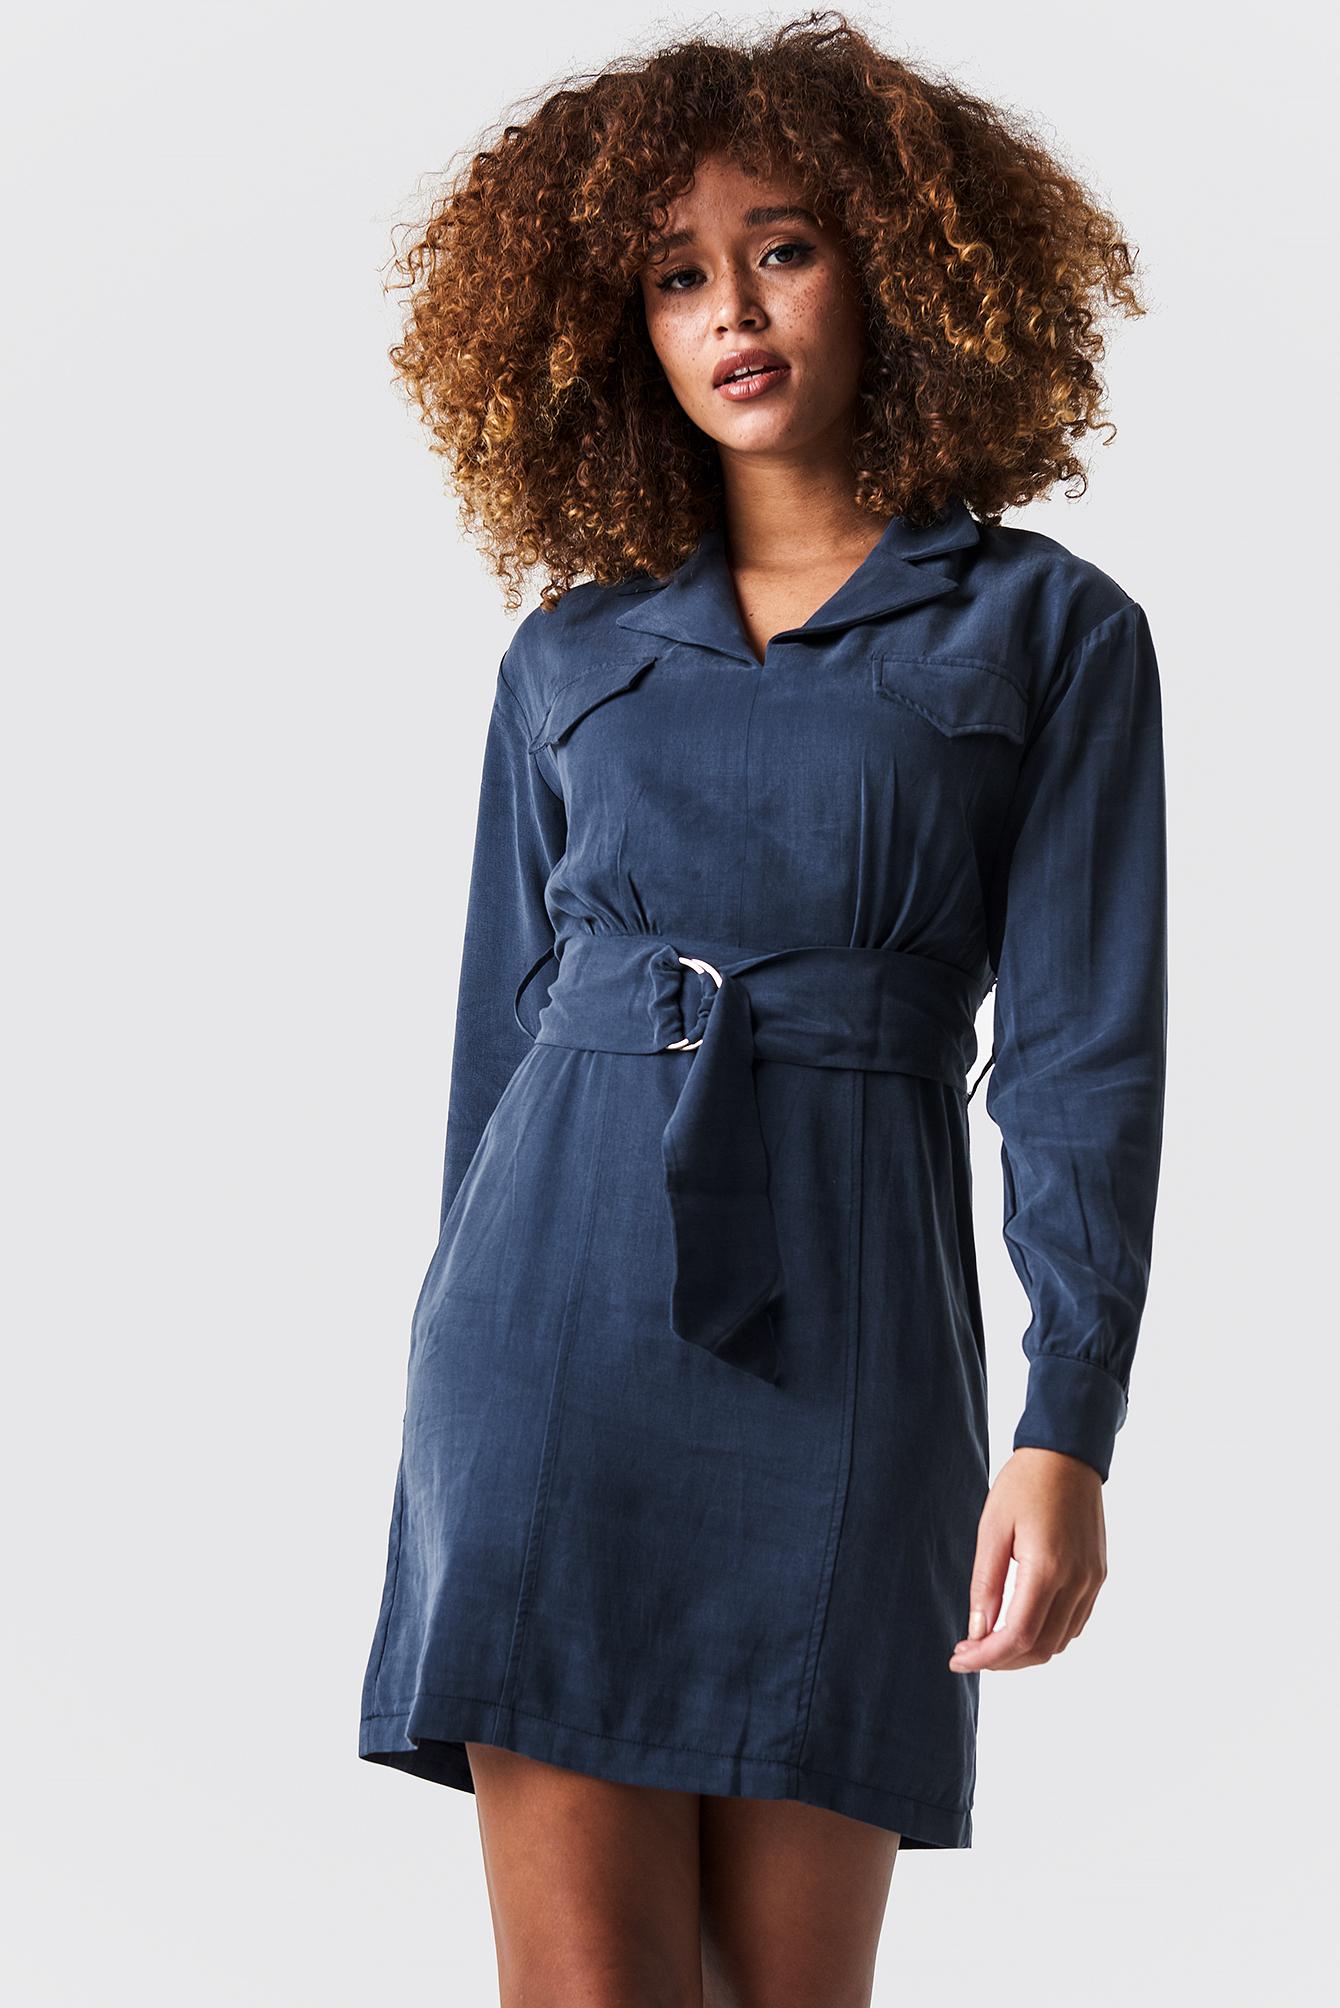 TRENDYOL Binding Detailed Mini Dress - Blue in Navy